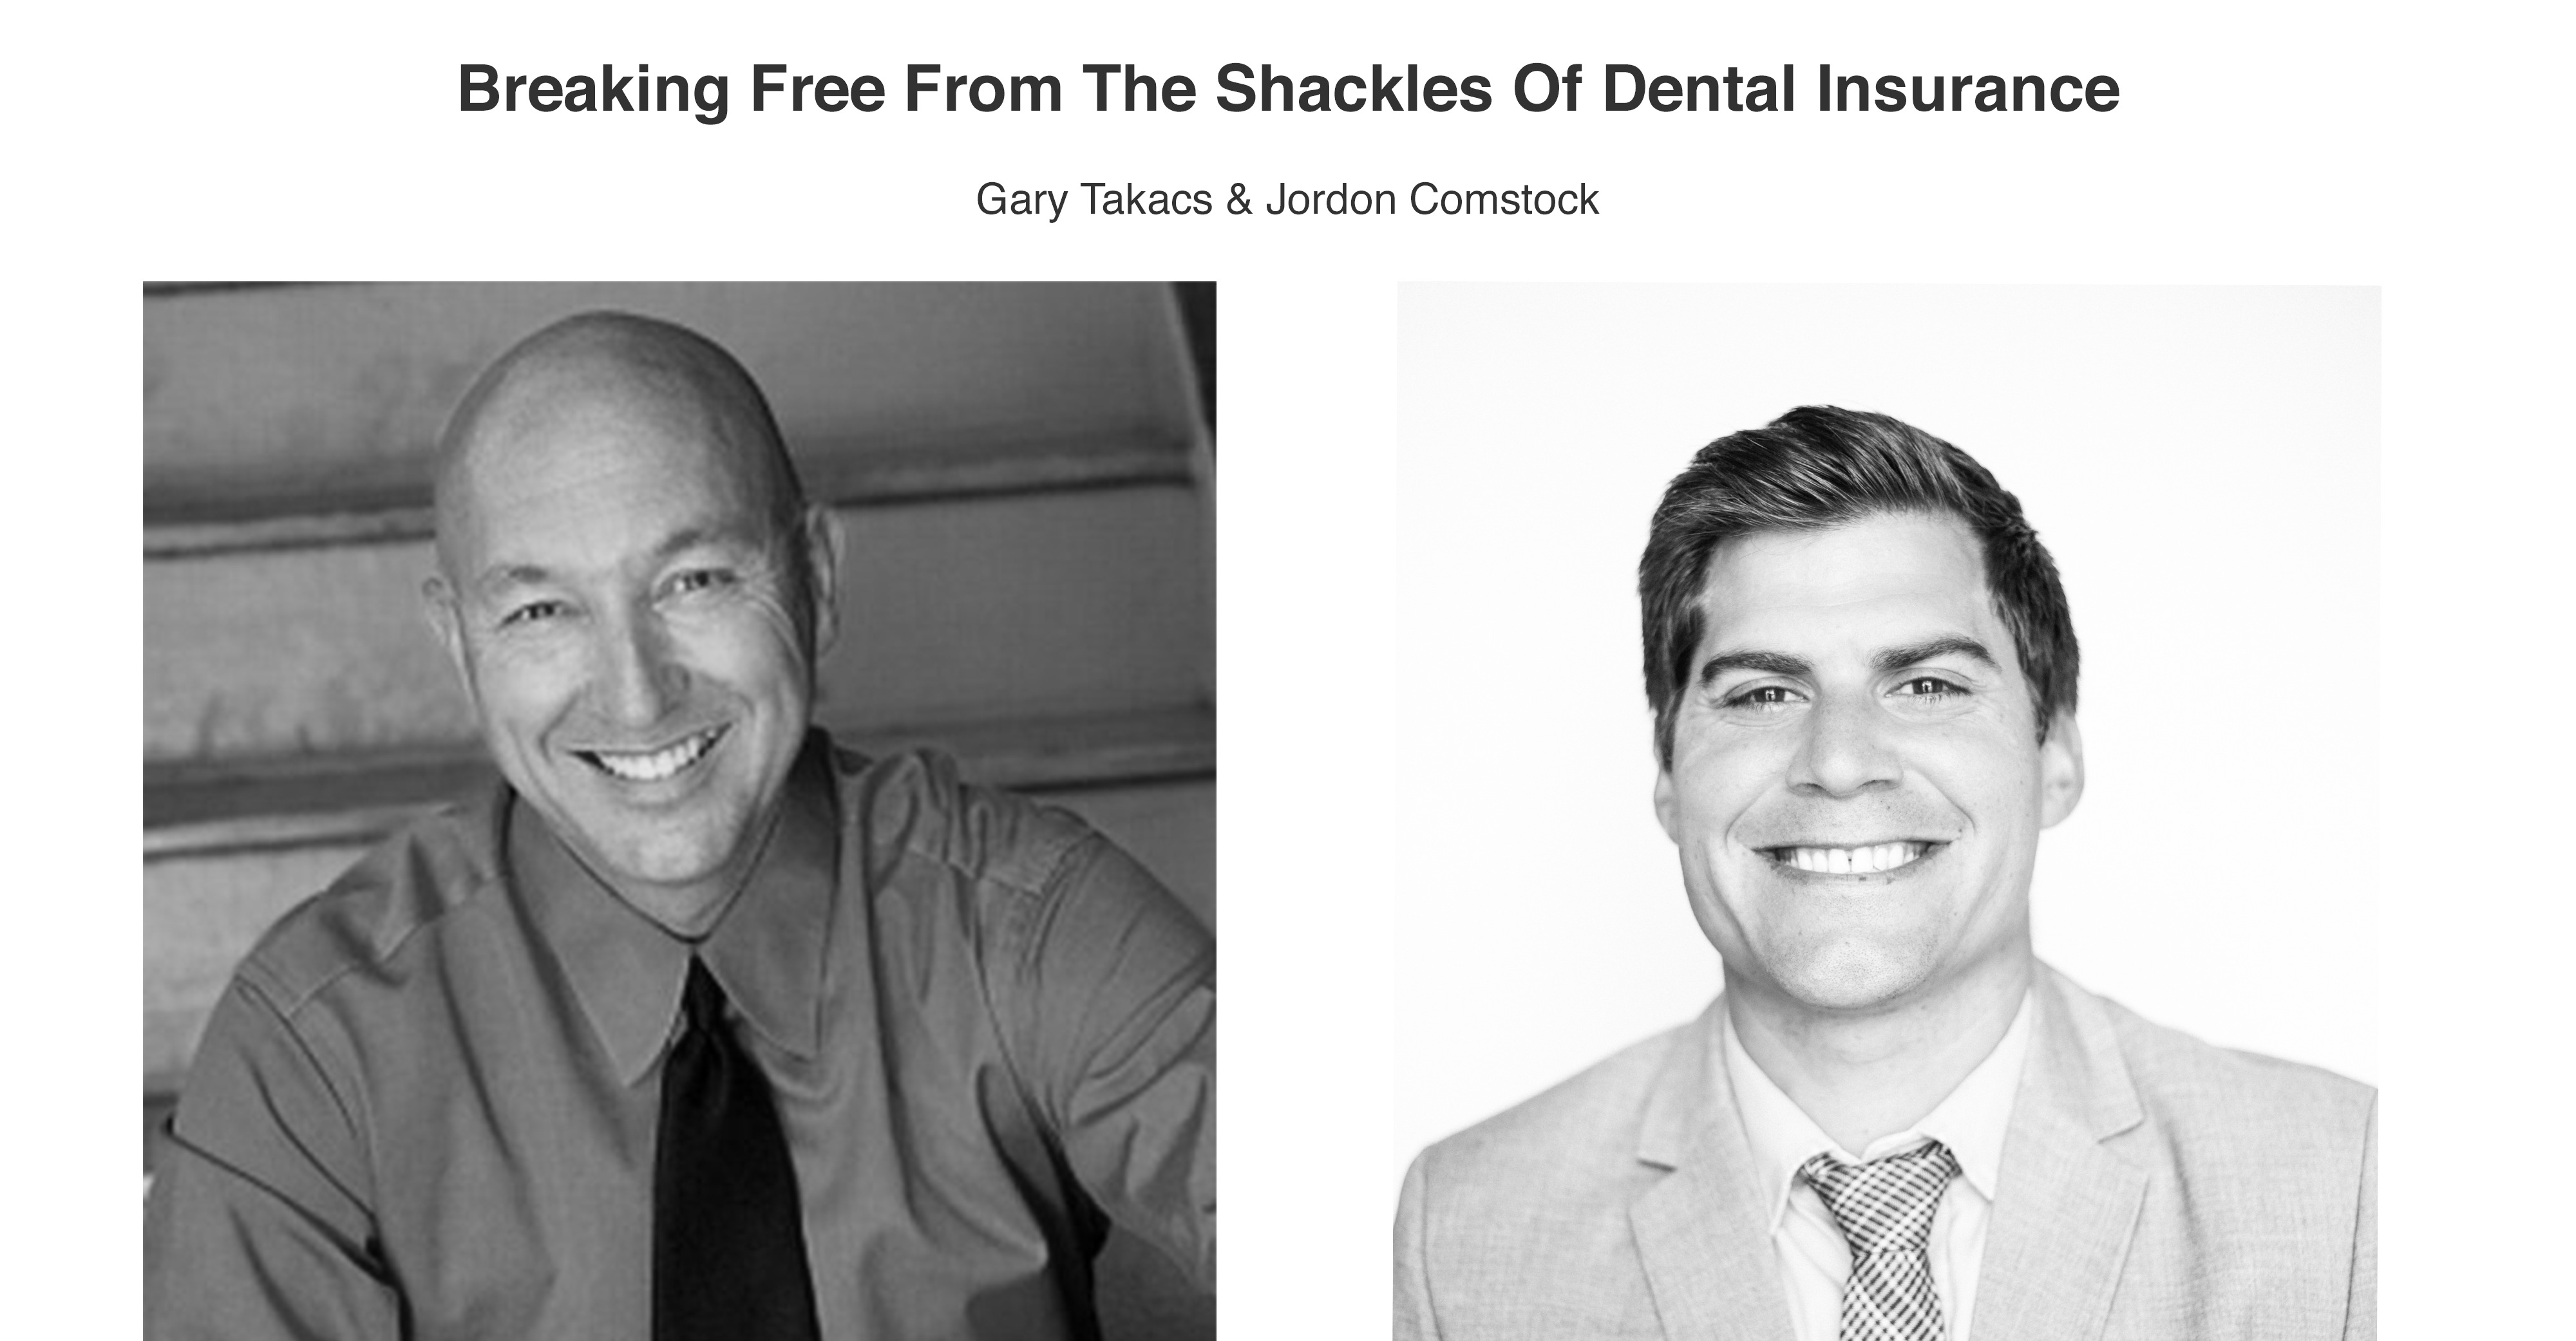 Gary-takacs-jordon-comstock-breaking-free.png